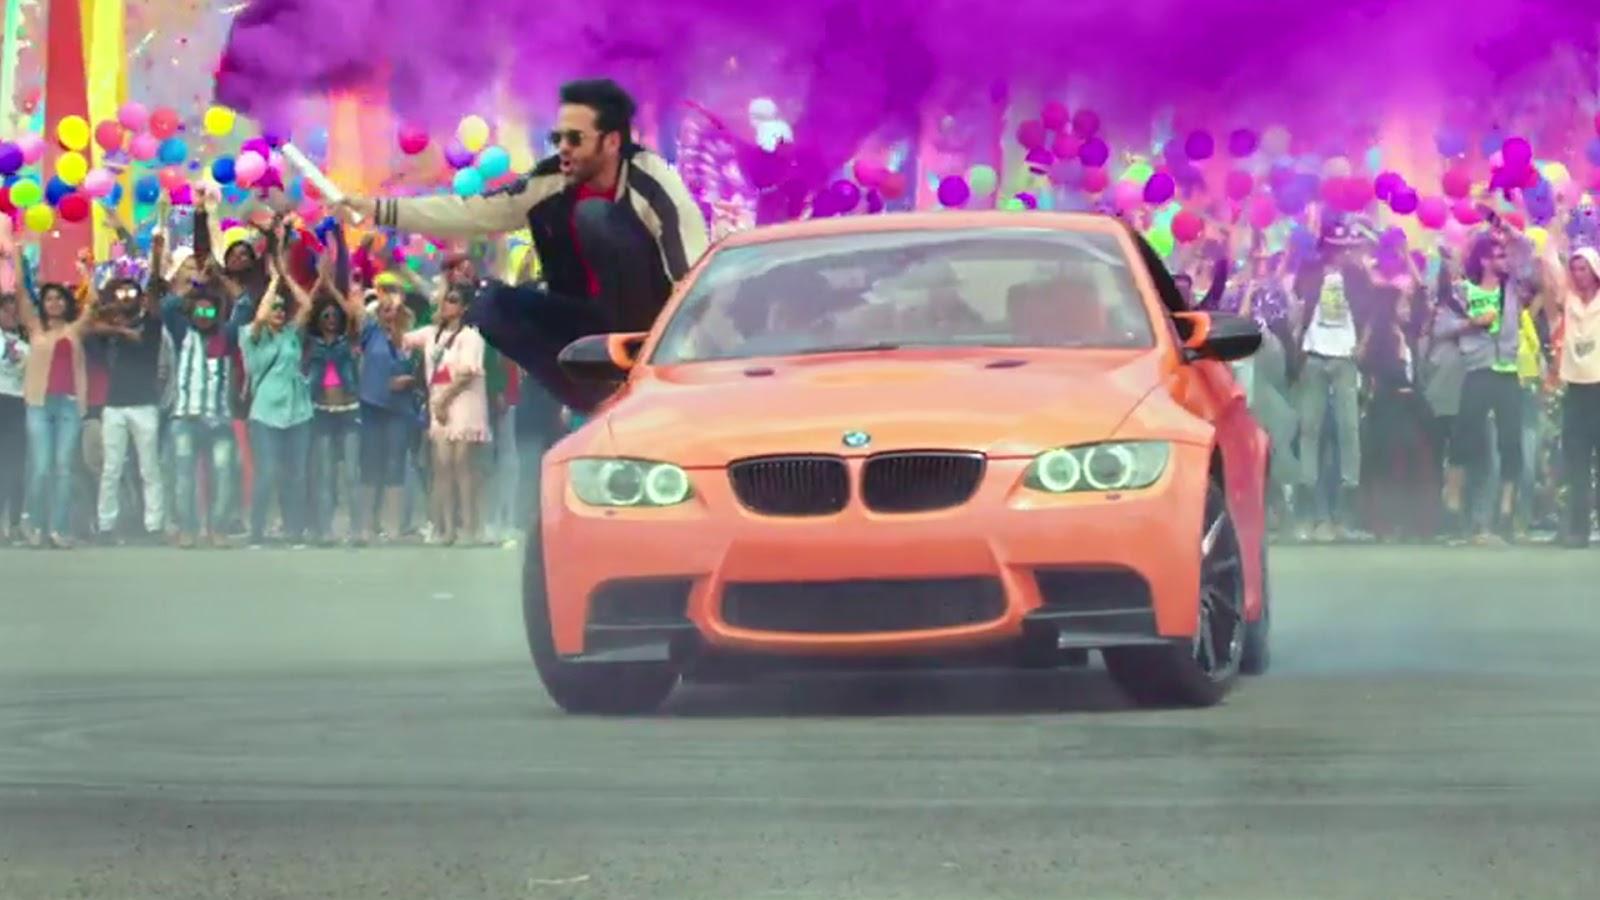 Golmaal Again Movie Hd Wallpapers Download Free 1080p